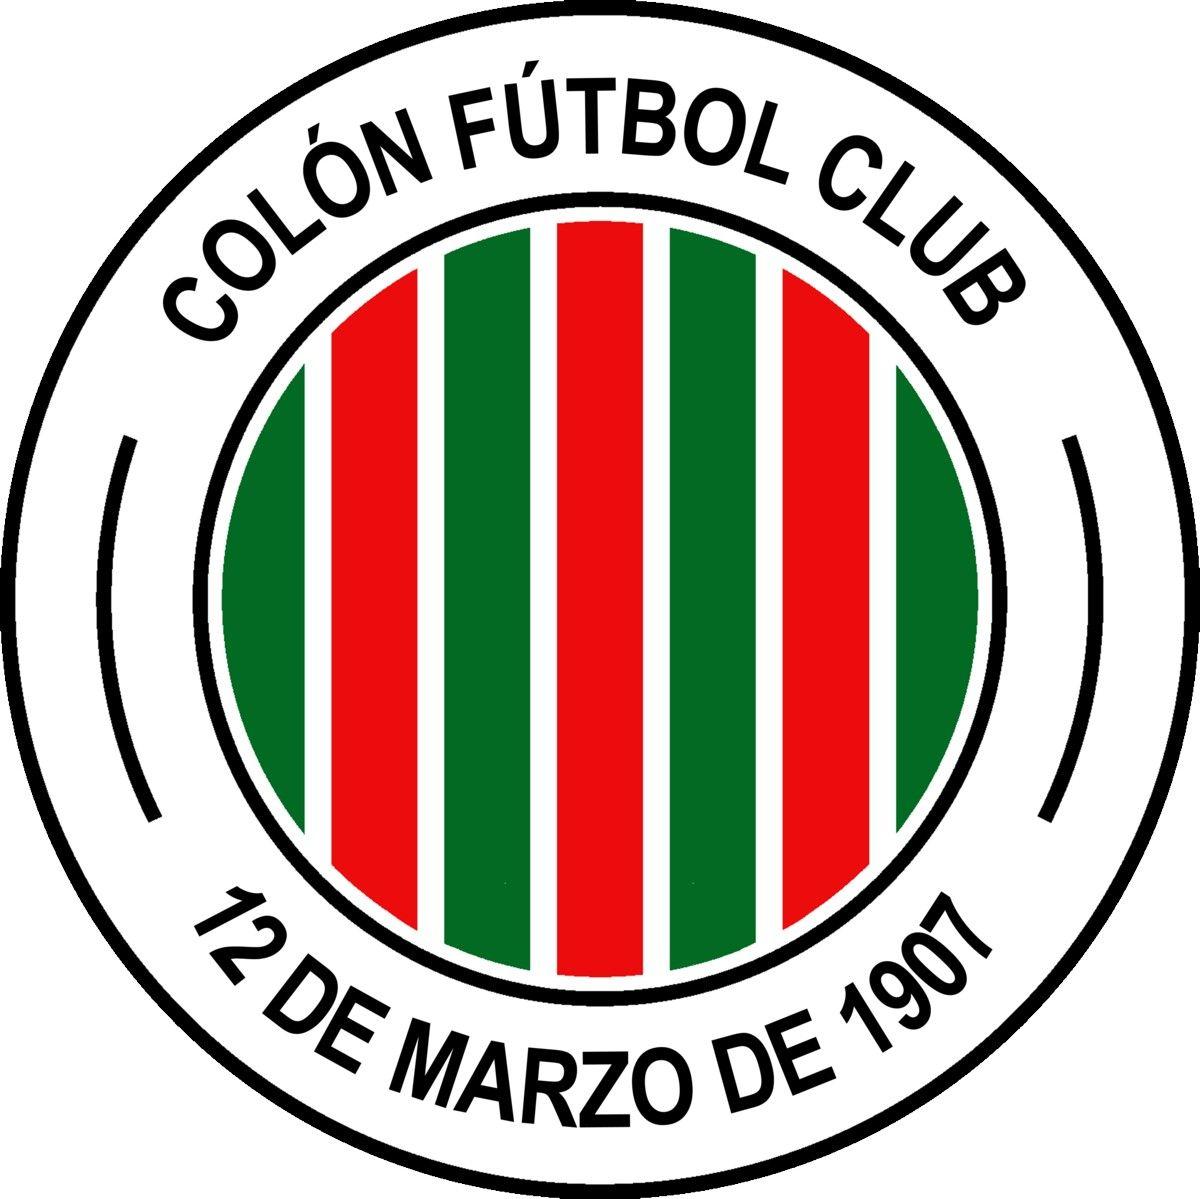 Colon Colon Futbol Club 1907 Montevideo Uruguay Montevideu Escudos De Futebol Futebol